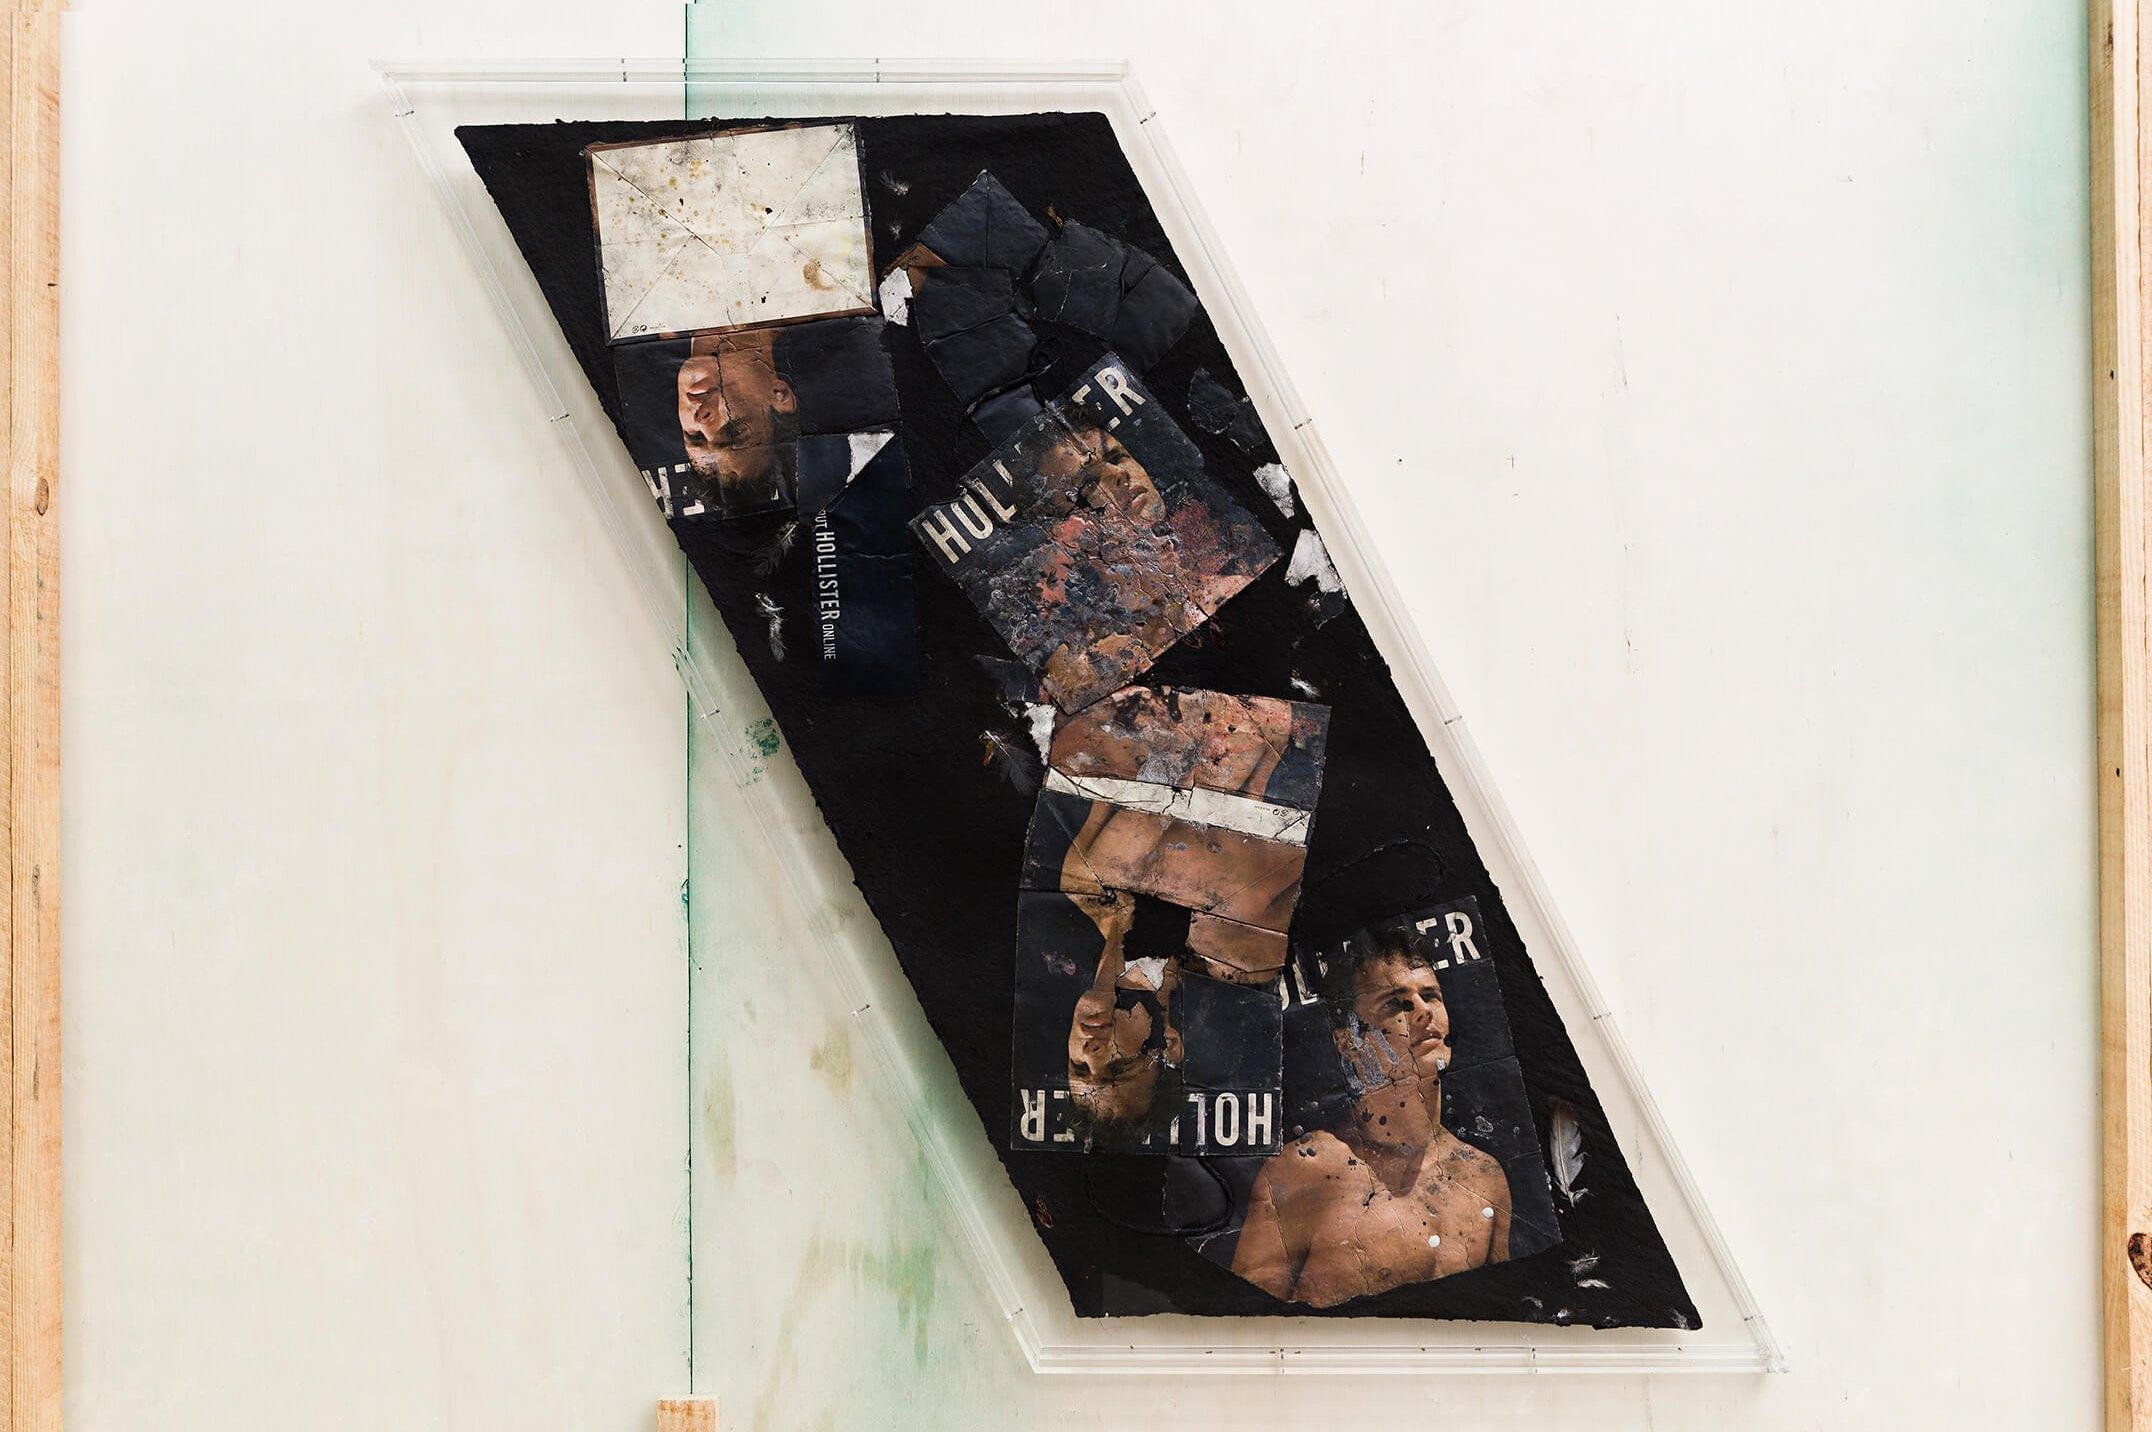 Stewart Uoo,<em>Untitled (Hollister Small Black)</em>, 2015, cotton, paper shopping bags, cockroaches (Periplaneta americana), pigment, polyurethane resin, synthetic fibers, dust,111,75 × 109,2 × 0,95 cm - Mendes Wood DM